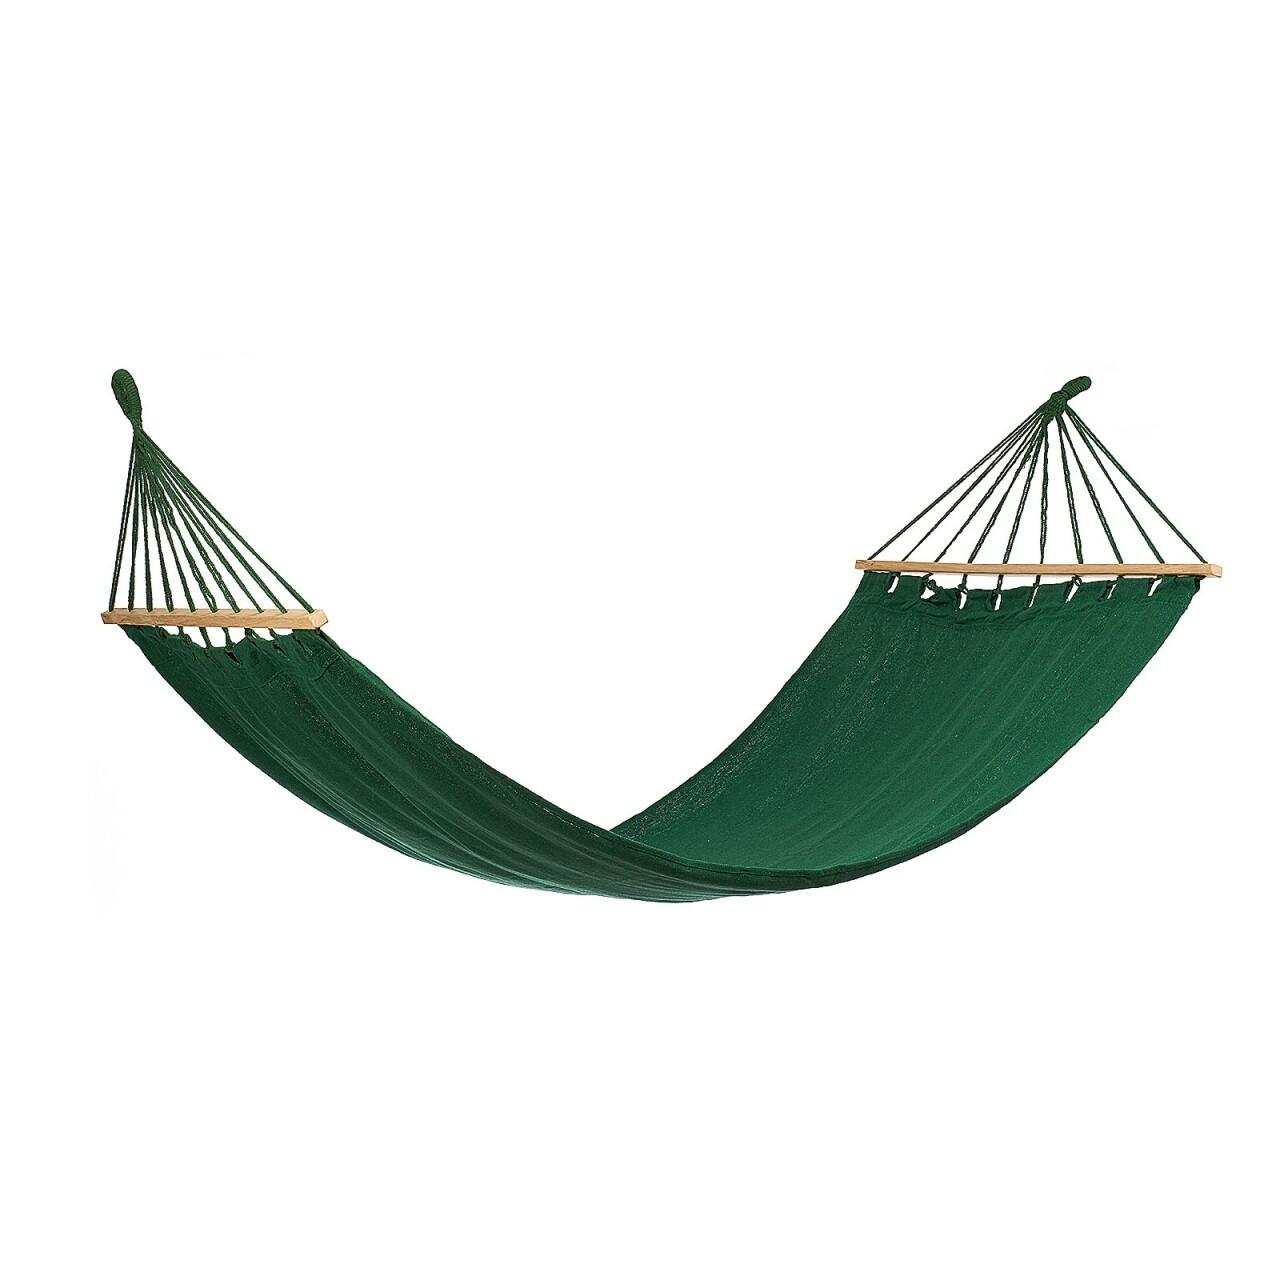 Hamac Green cu bare de lemn, 200x80 cm, Heinner